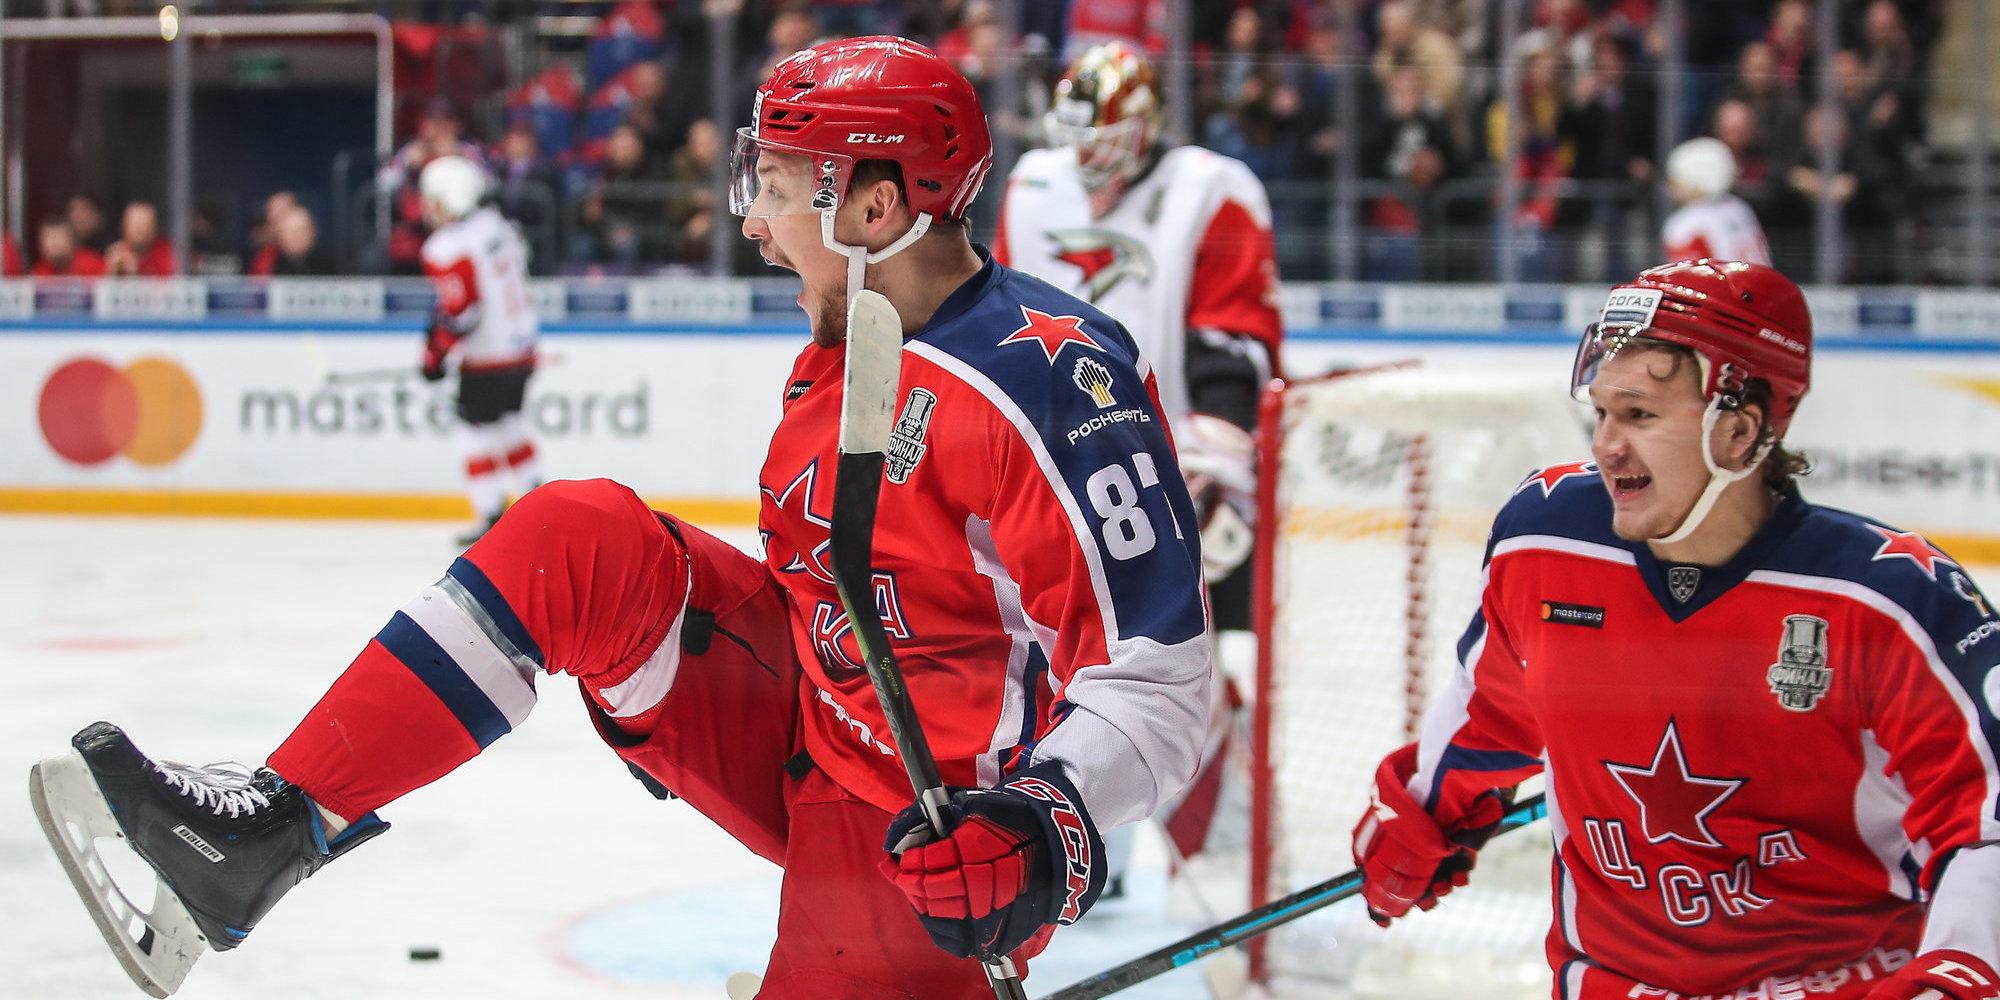 ЦСКА продлил контракт со Светлаковым